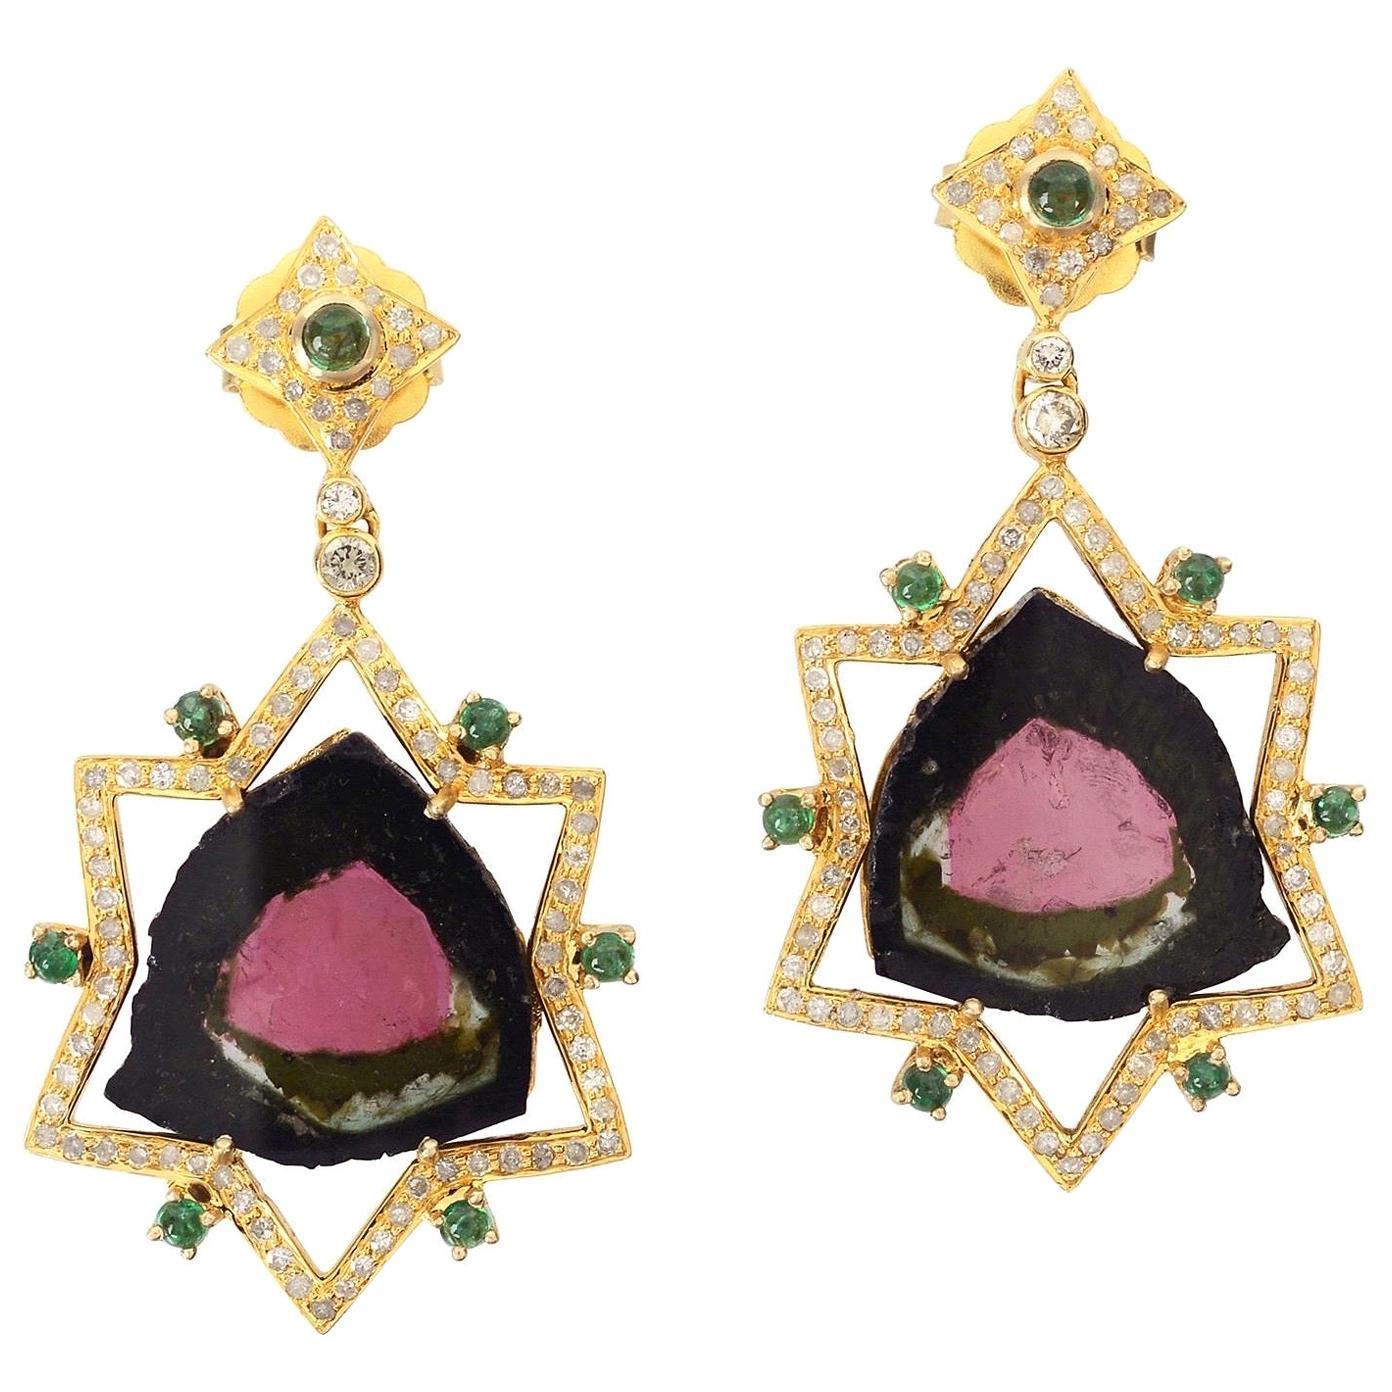 21.51 Carat Tourmaline Emerald Diamond 18 Karat Gold Earrings